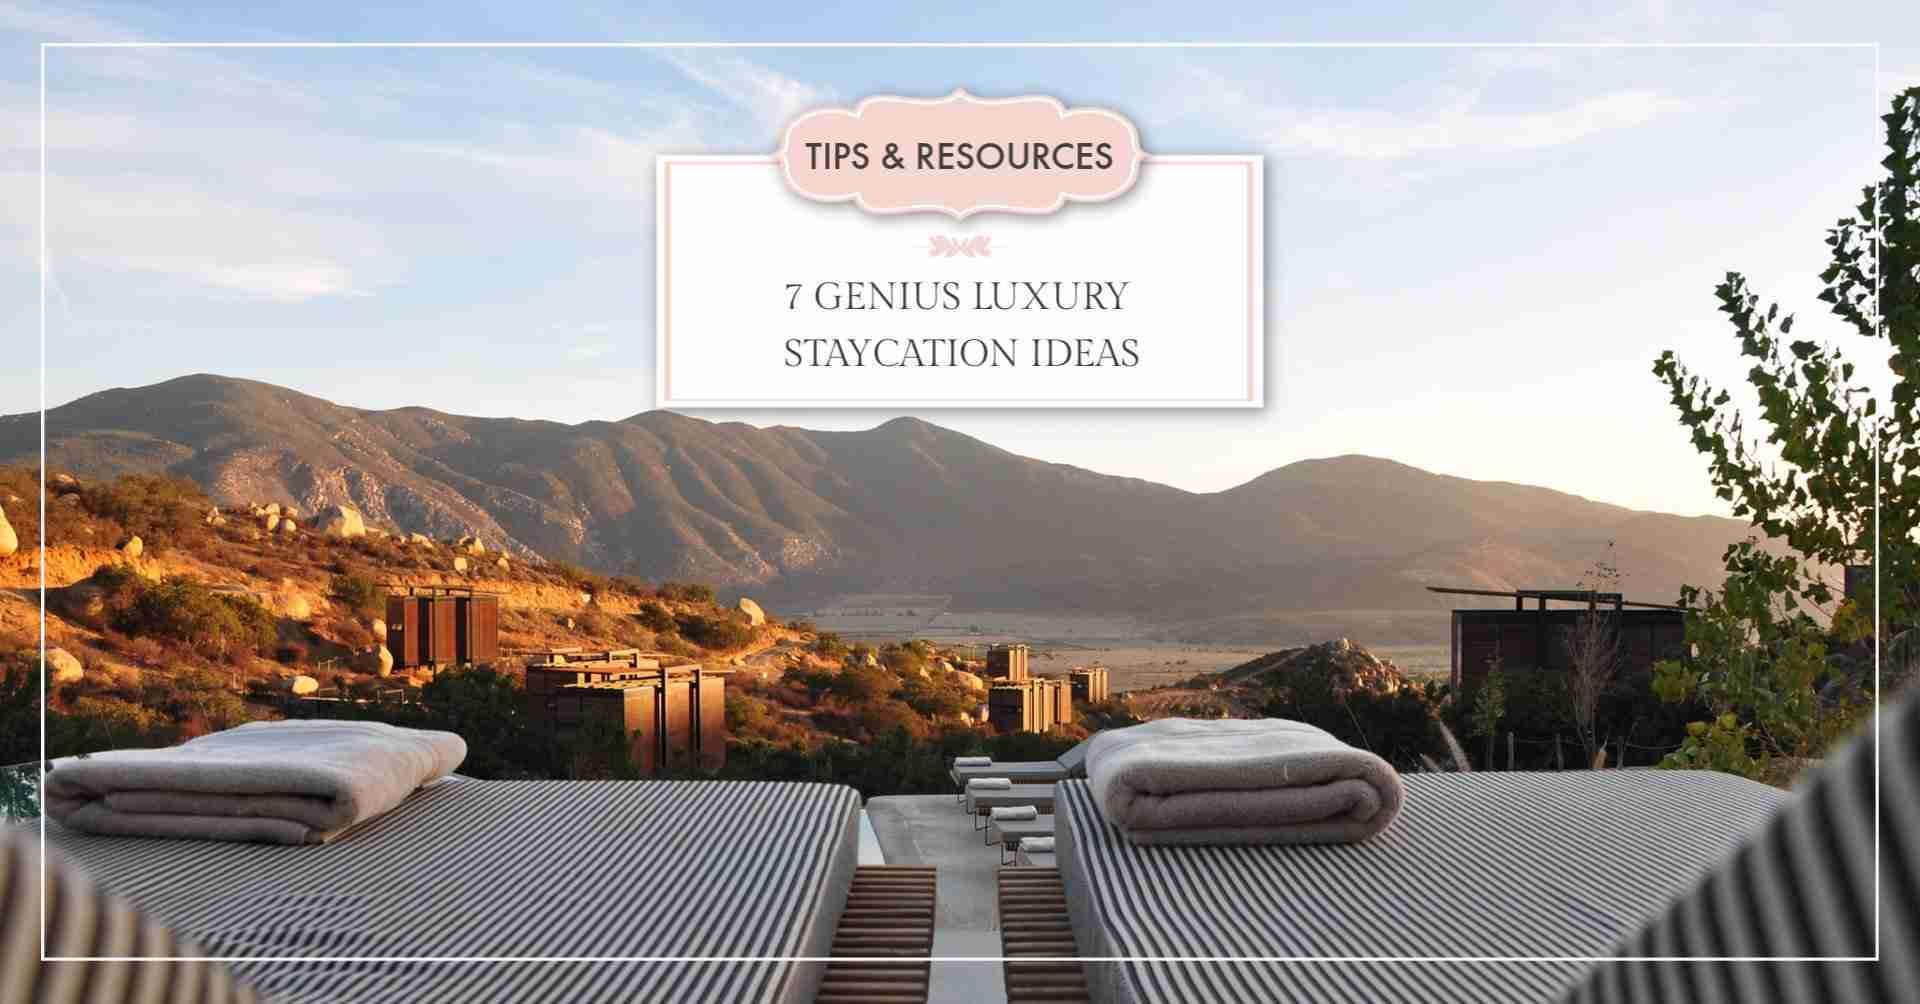 7 Genius Luxury Staycation Ideas